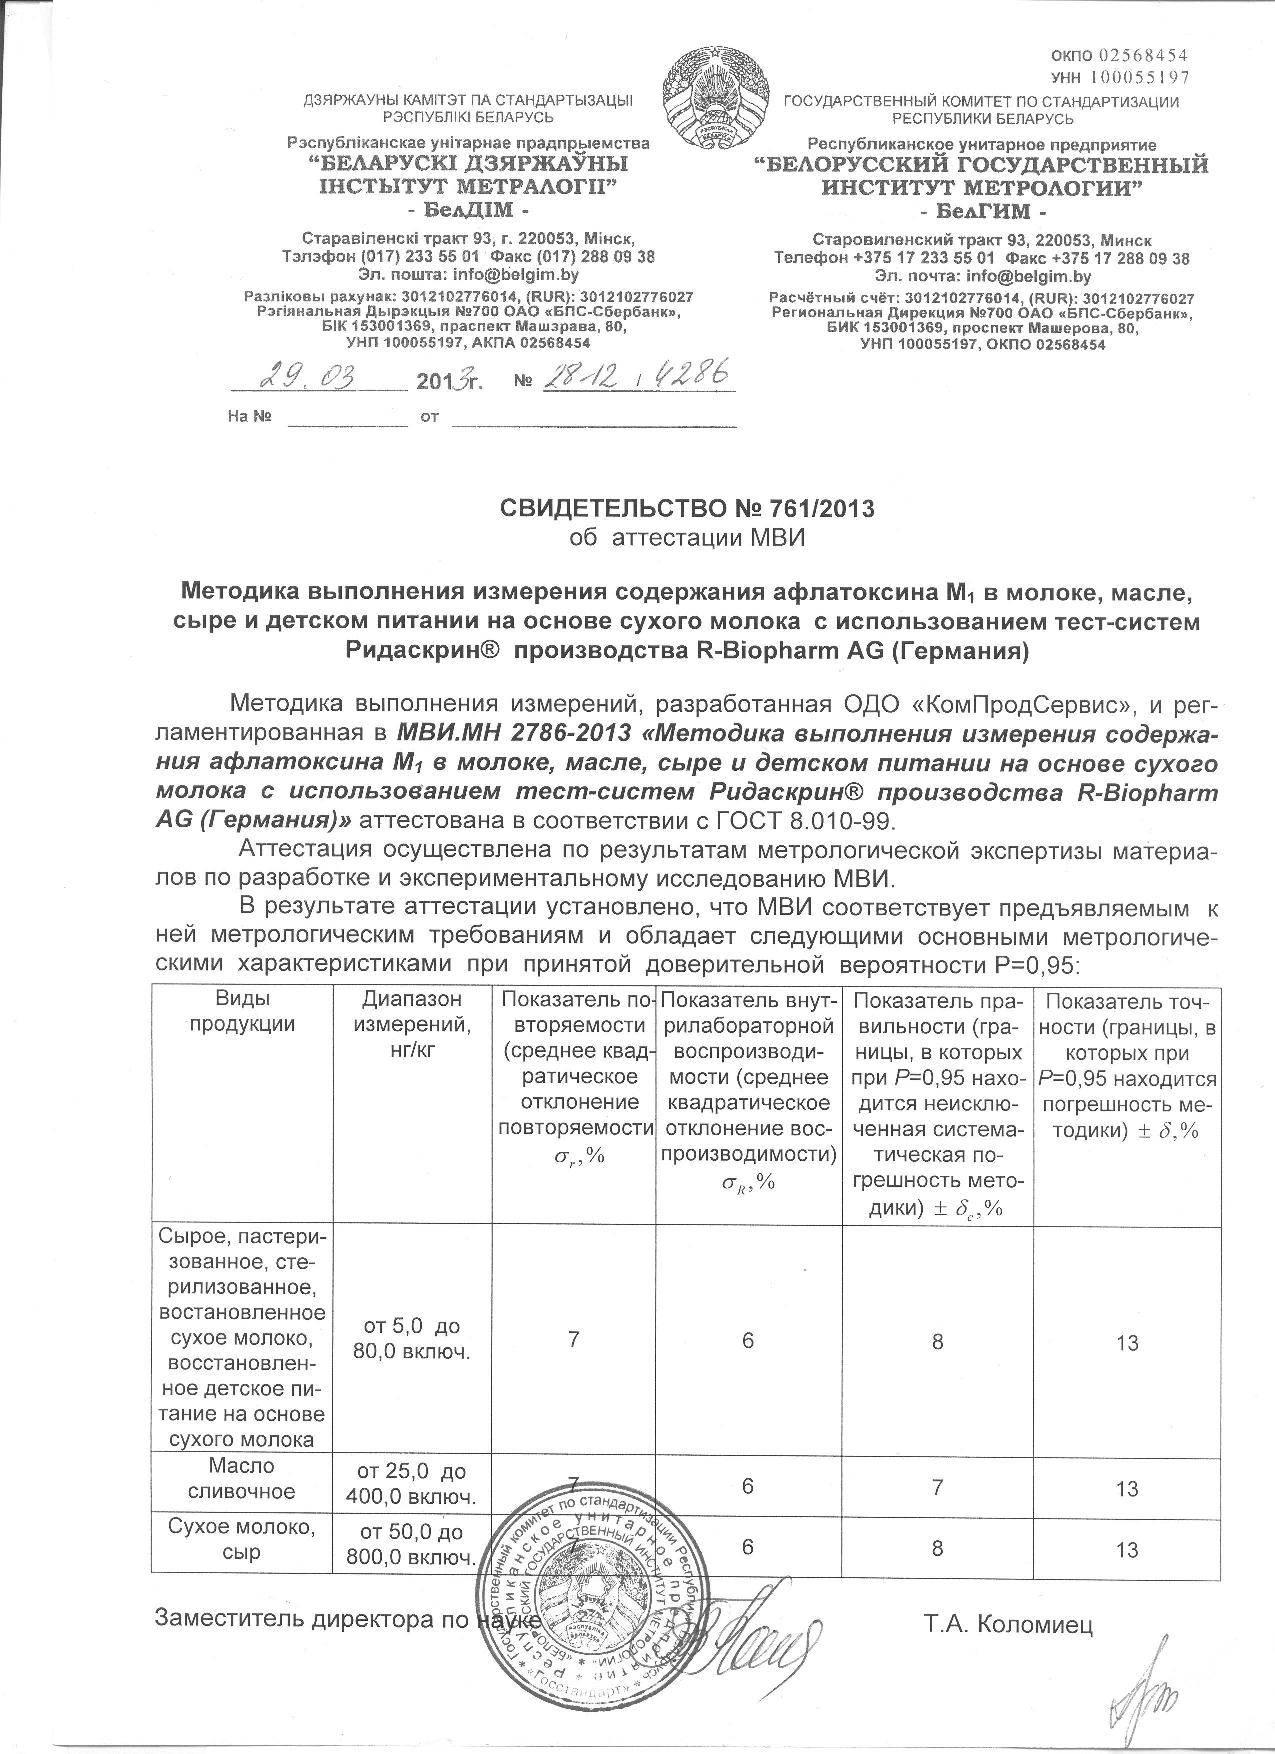 МВИ МН 2786-2013